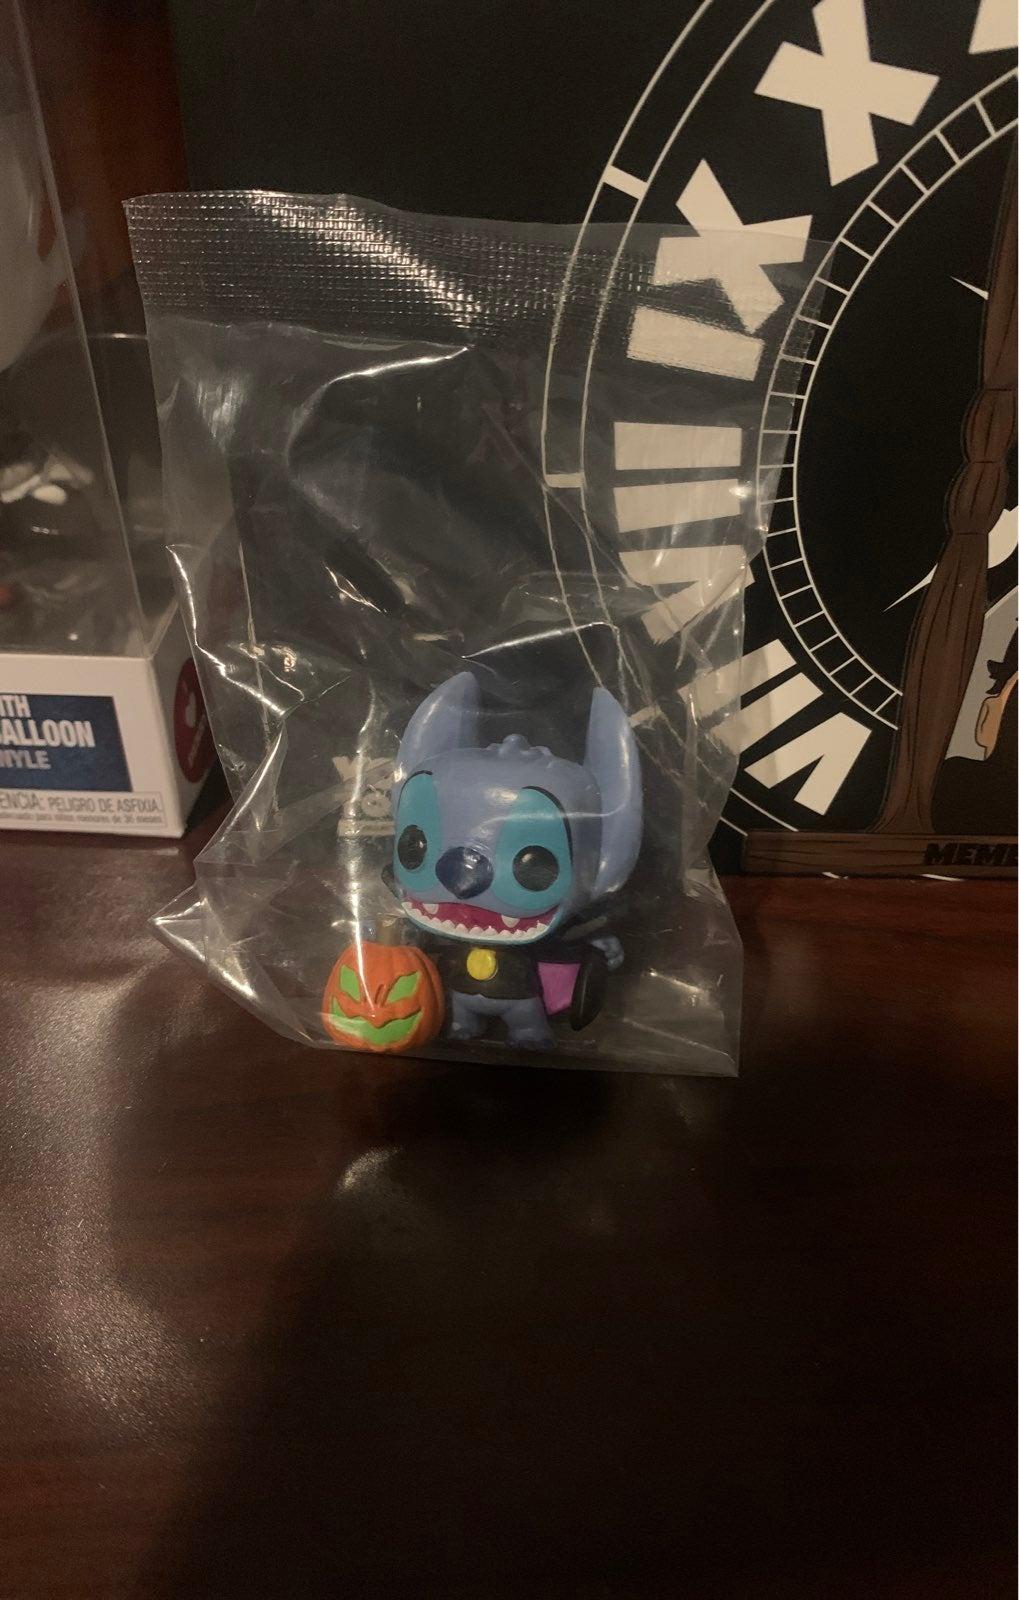 Stitch halloween figure only. No box